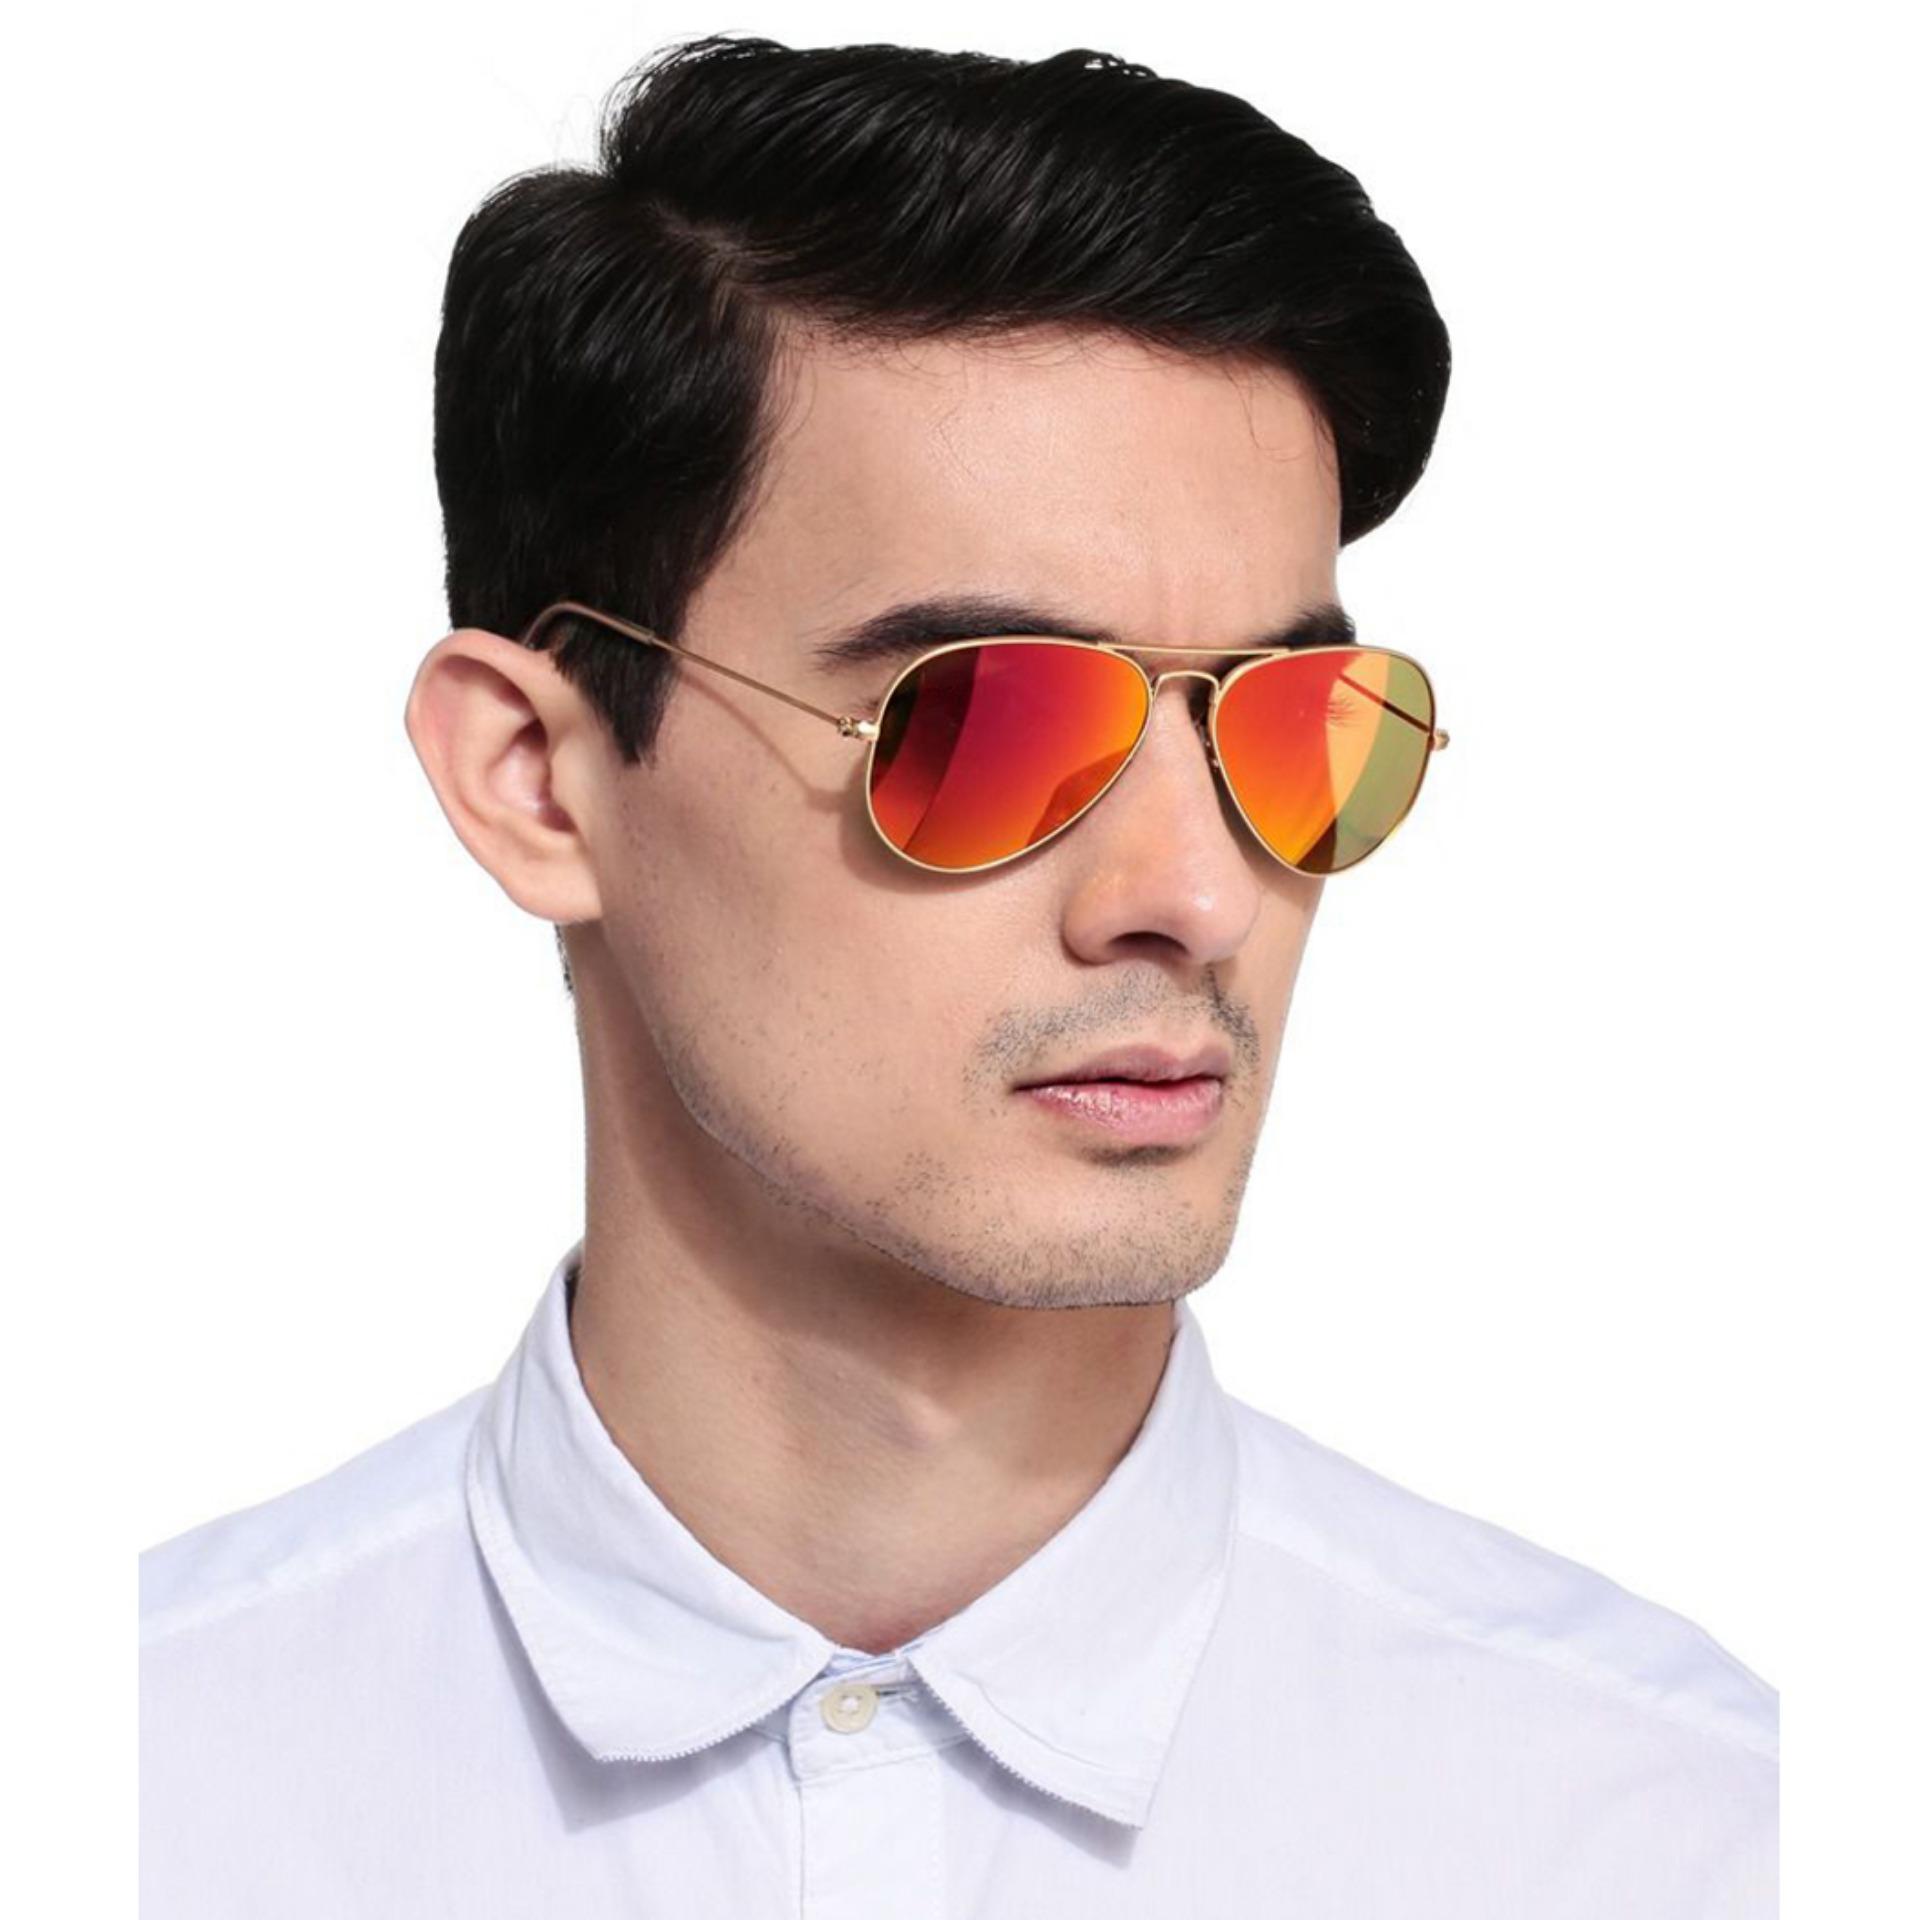 ID Sunglass - Kacamata Aviator Pria Wanita - Stainless Silver - Lensa  Coklat . 67e487bbdc